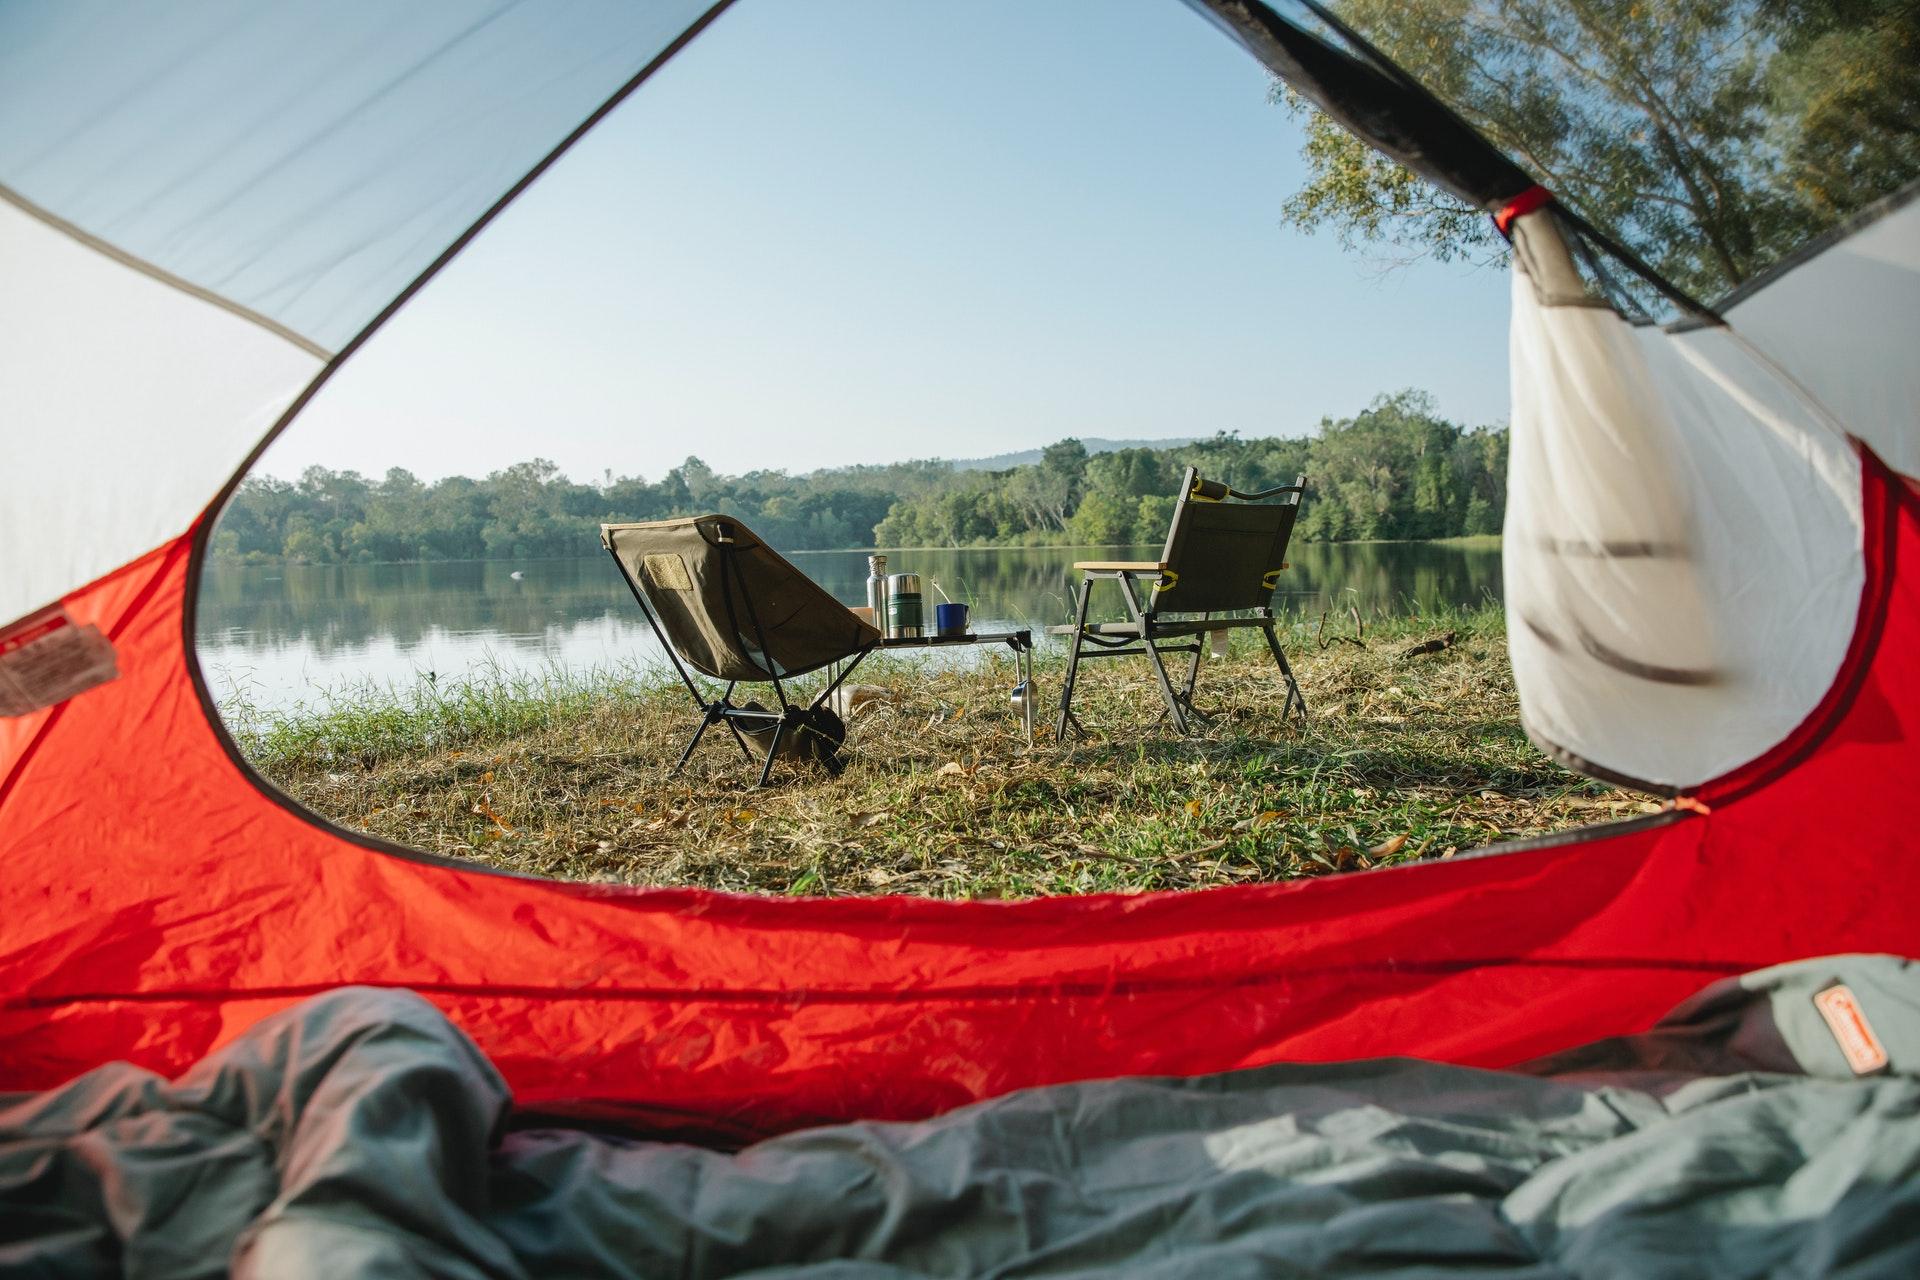 plan-insular-ordenacion-fuerteventura-regular-actividades-camping